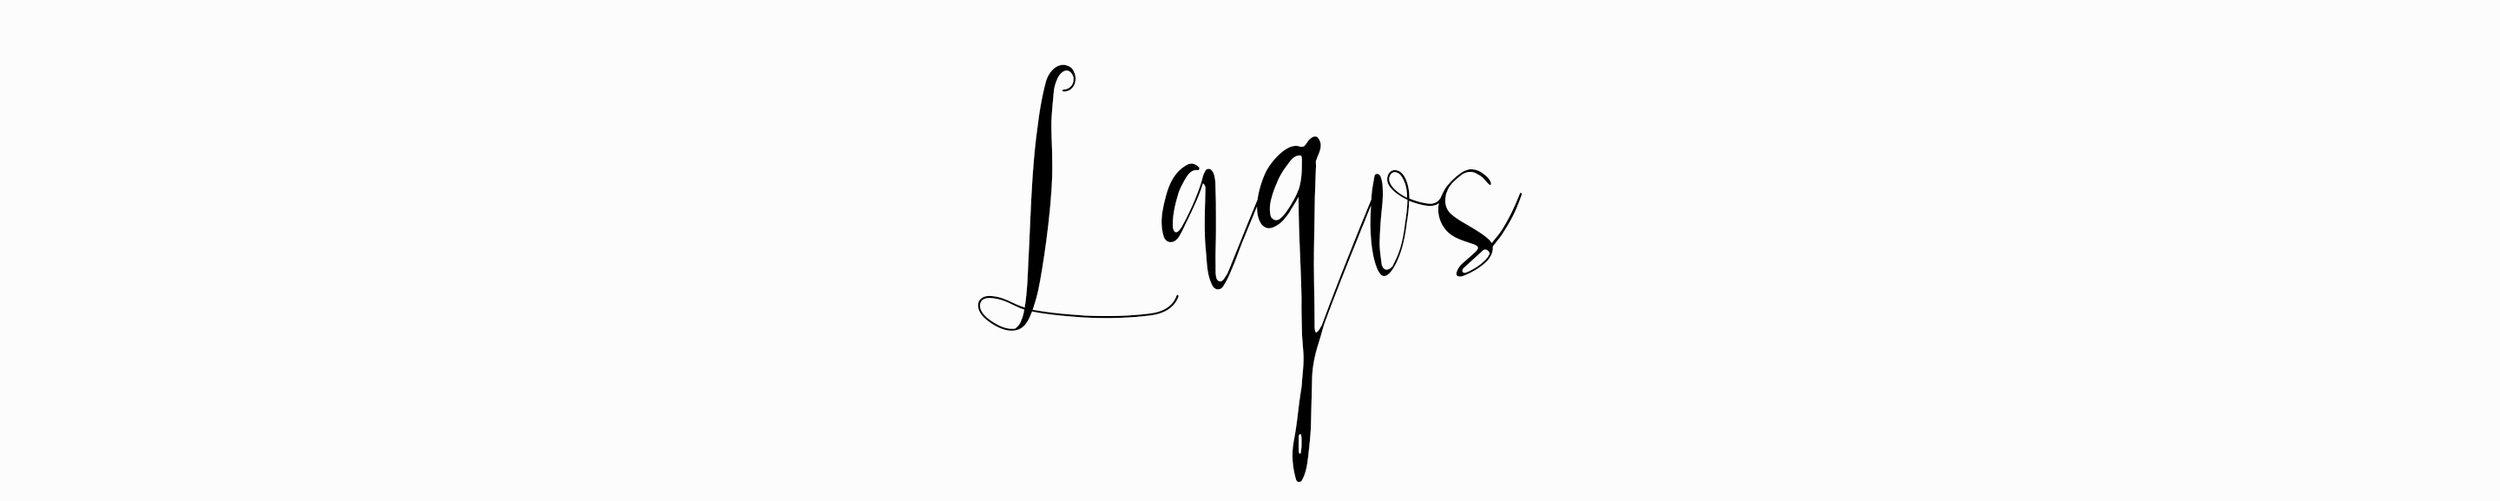 Lagos_0000.jpg